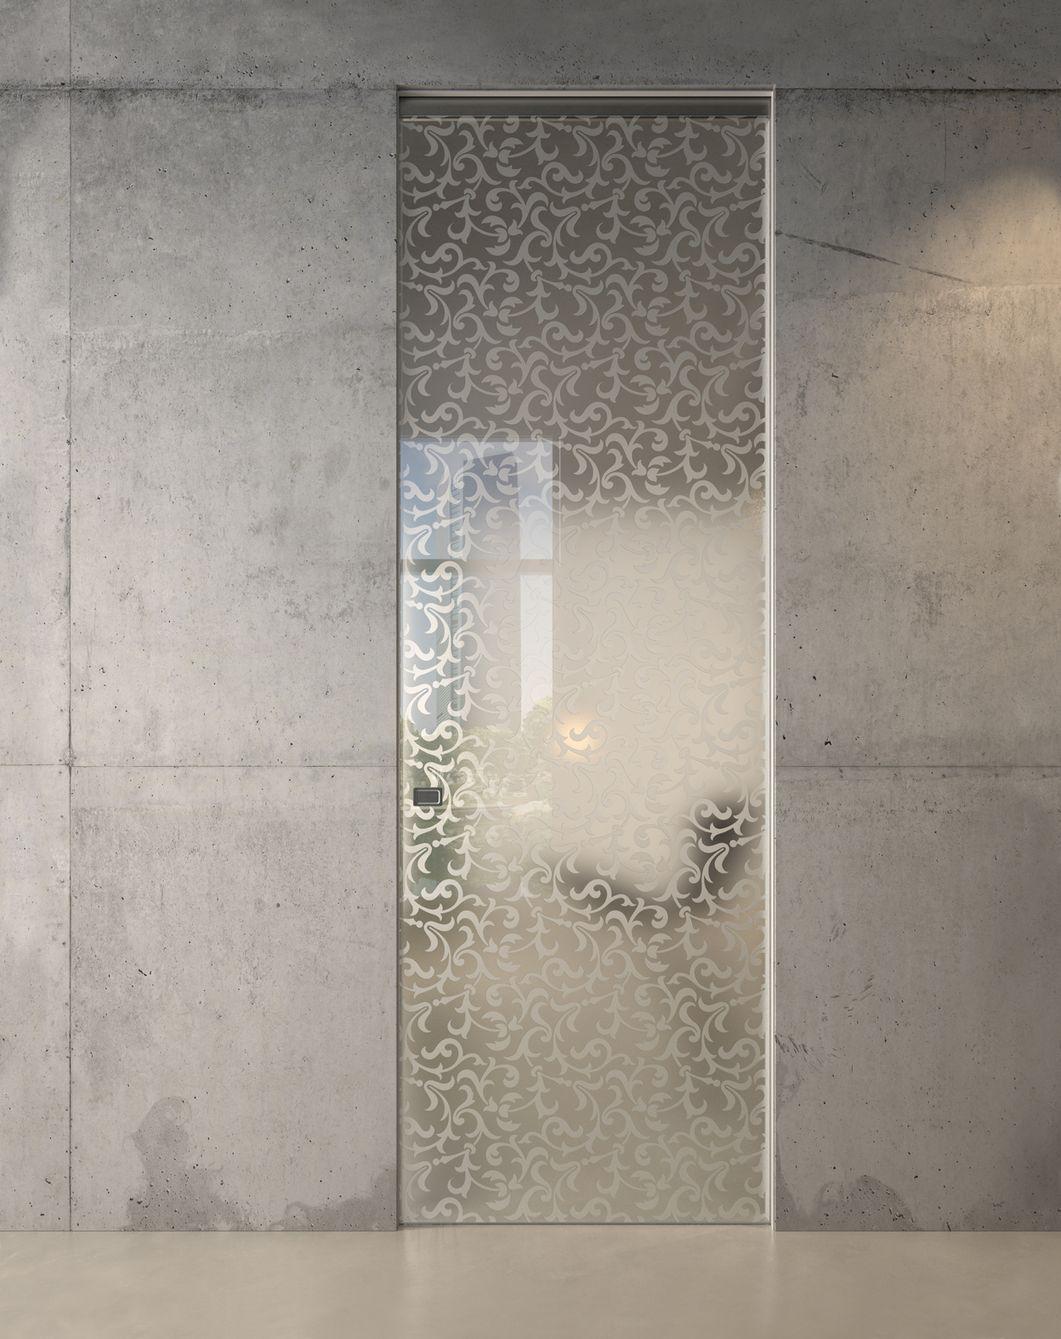 Nussbaum fiandra madras bianco verticale